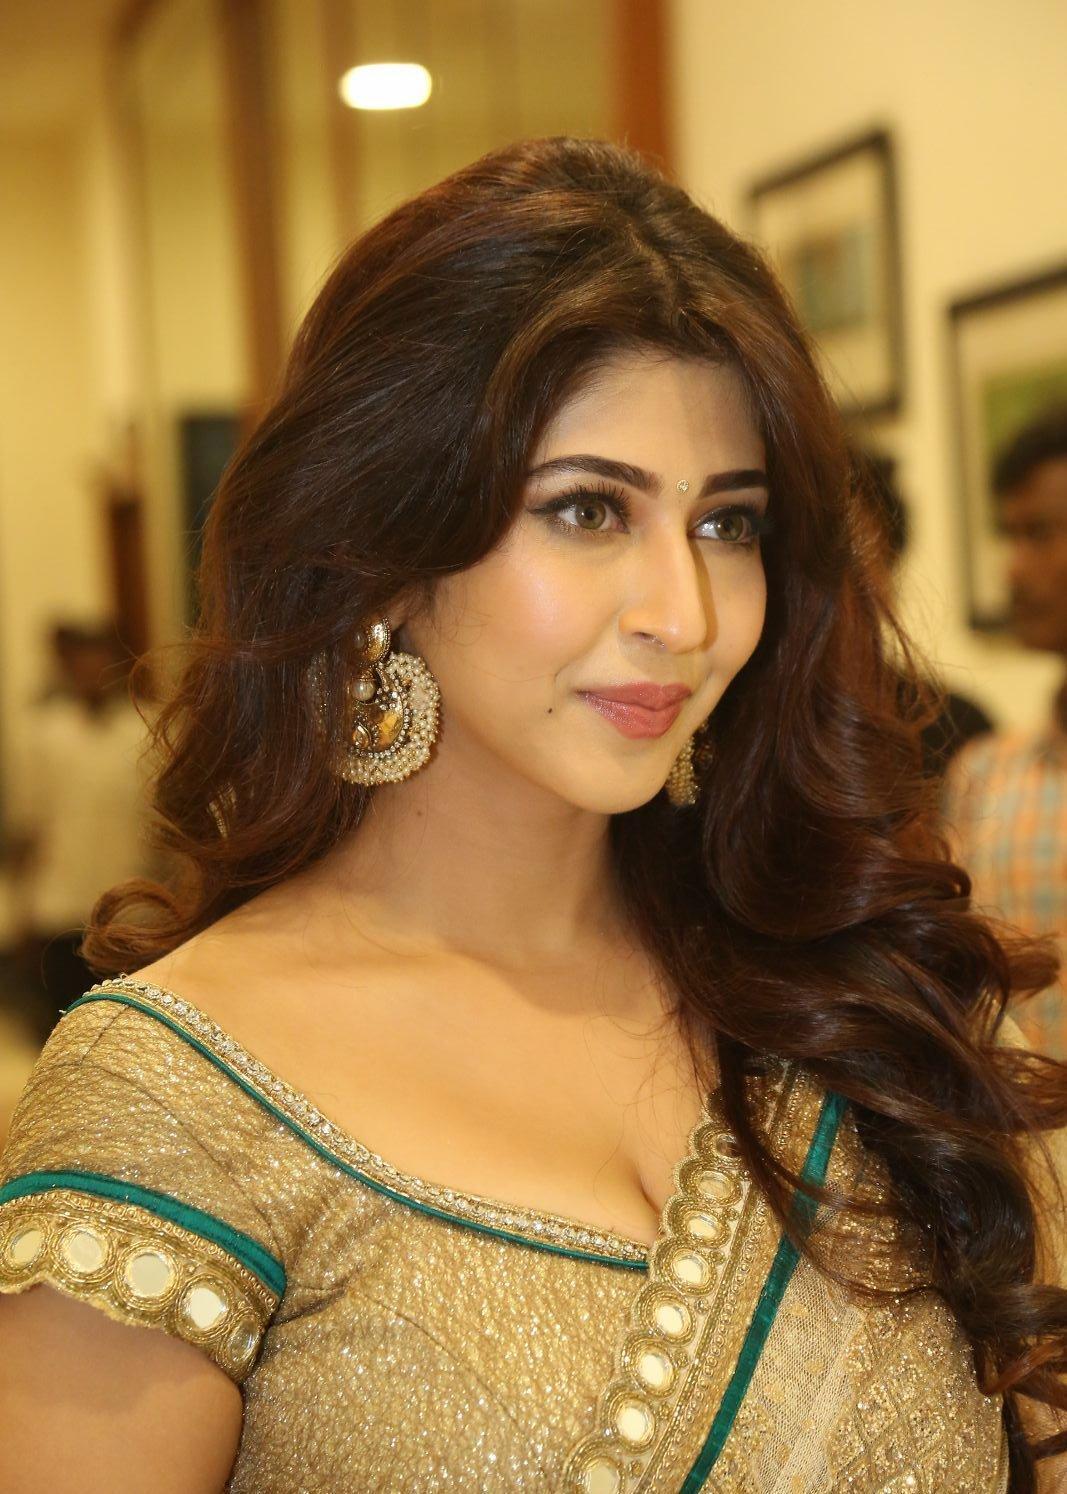 Sonarika Bhadoria Looks Irresistibly Sexy In Saree At -5812